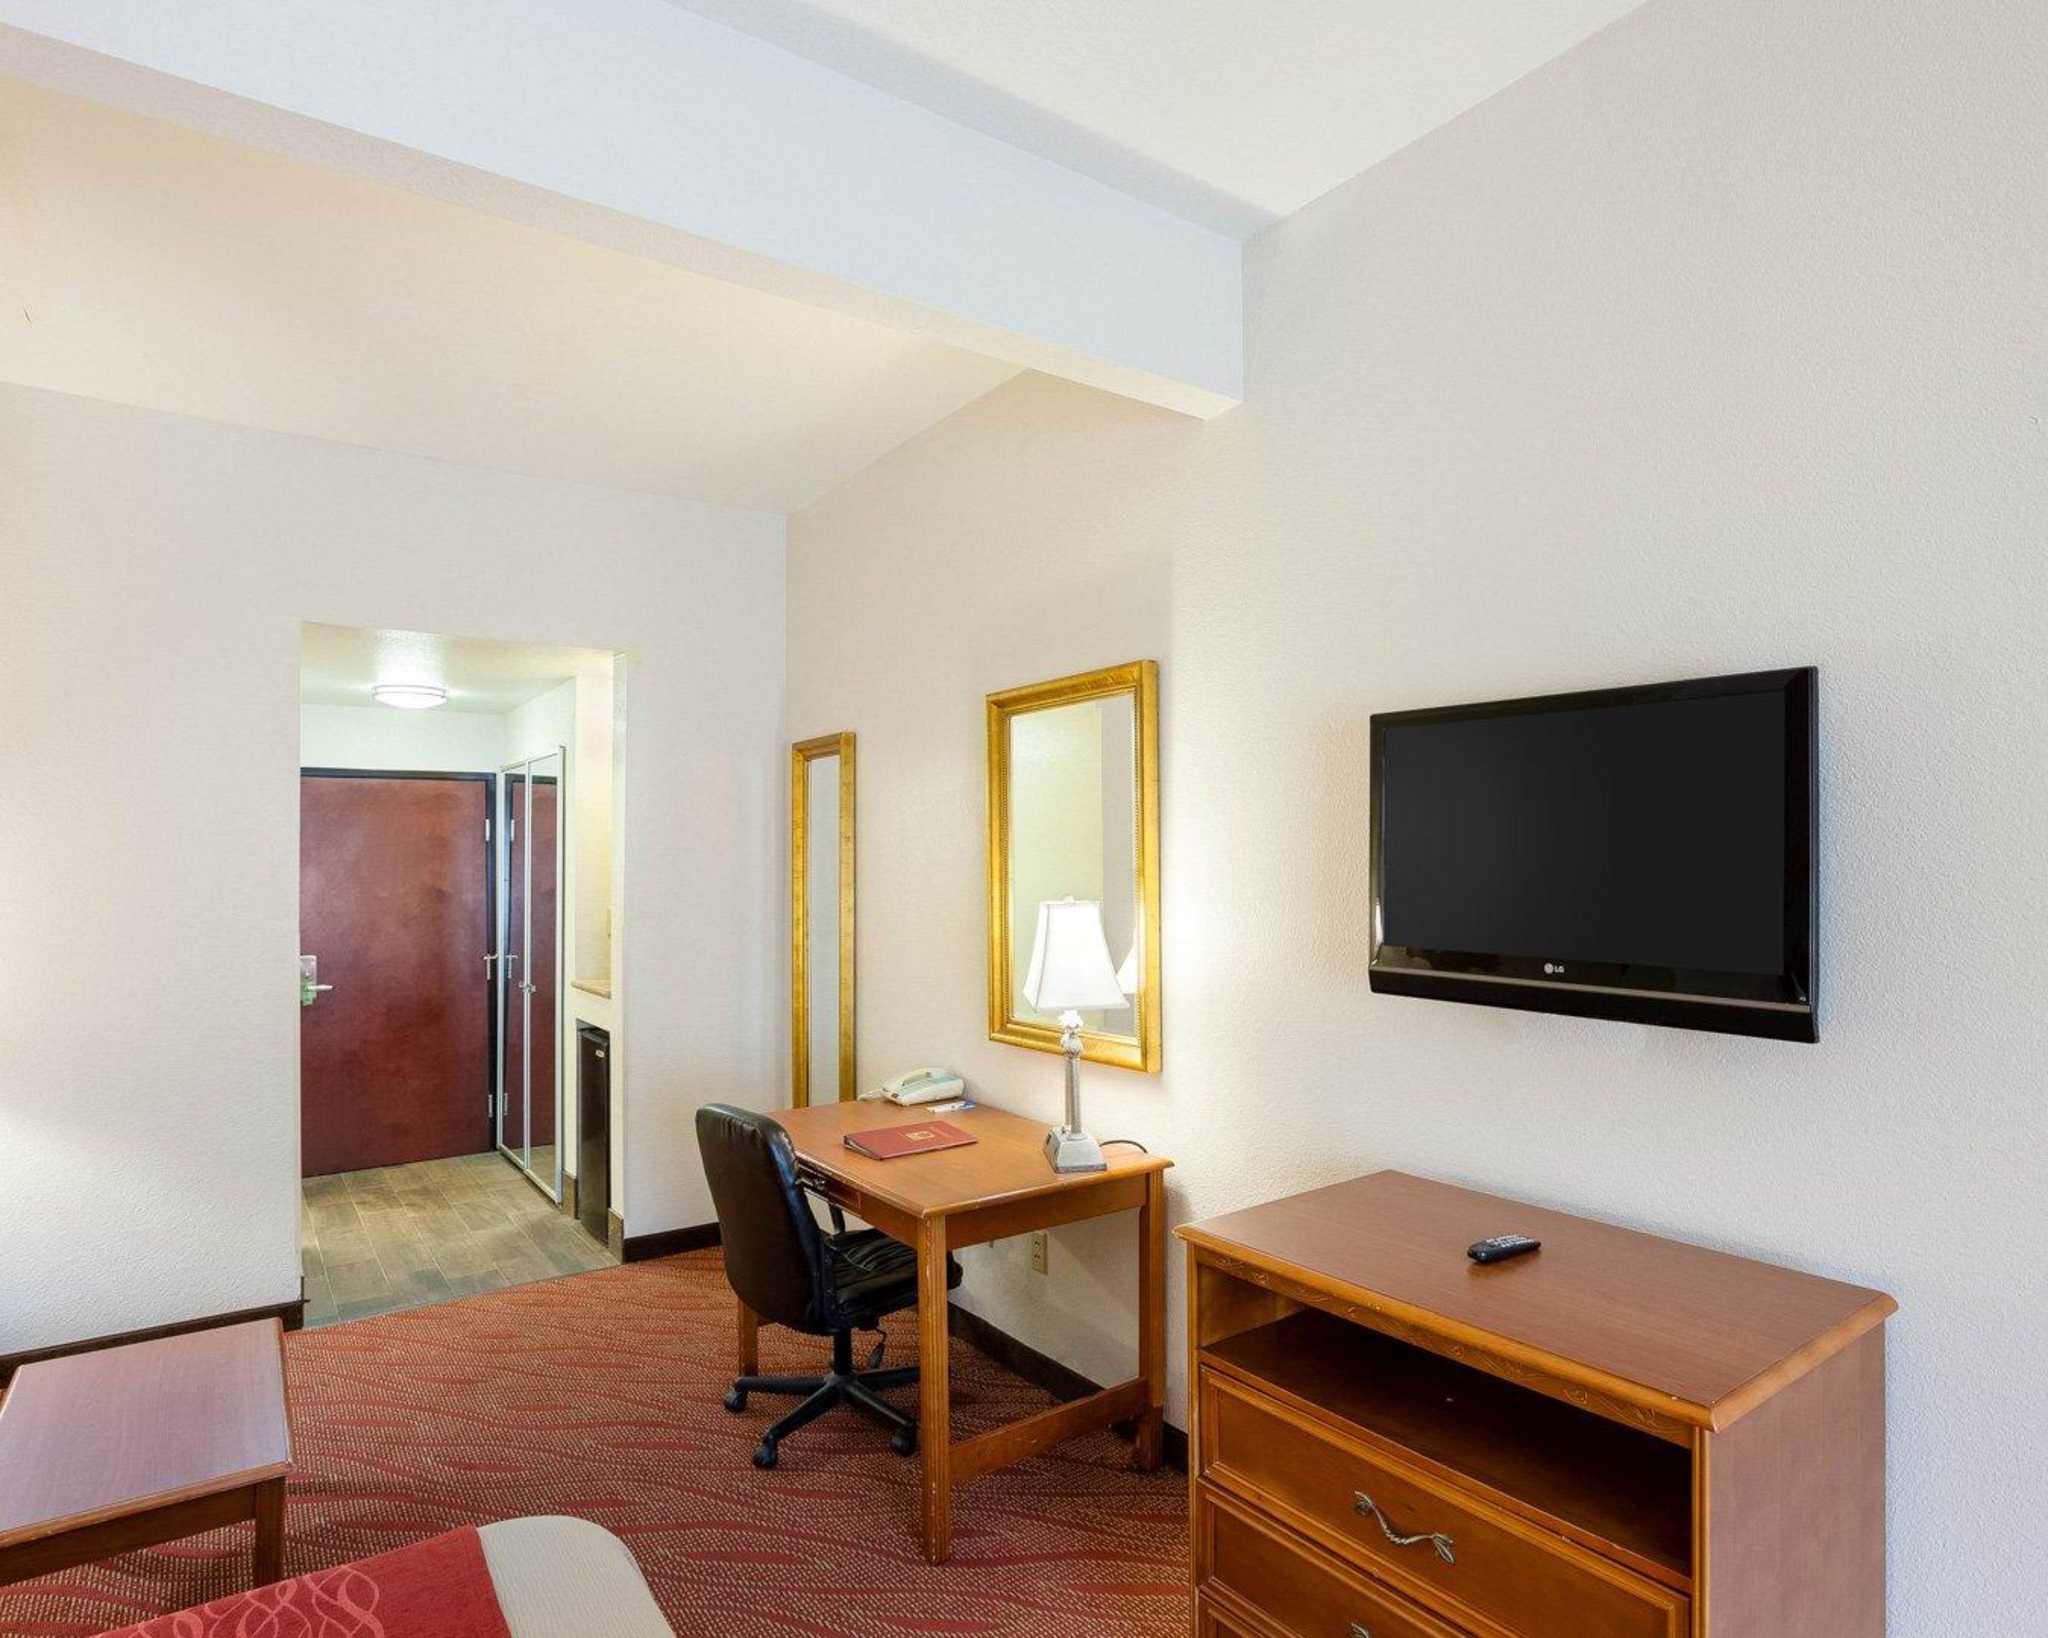 Comfort Inn & Suites Near Medical Center image 28